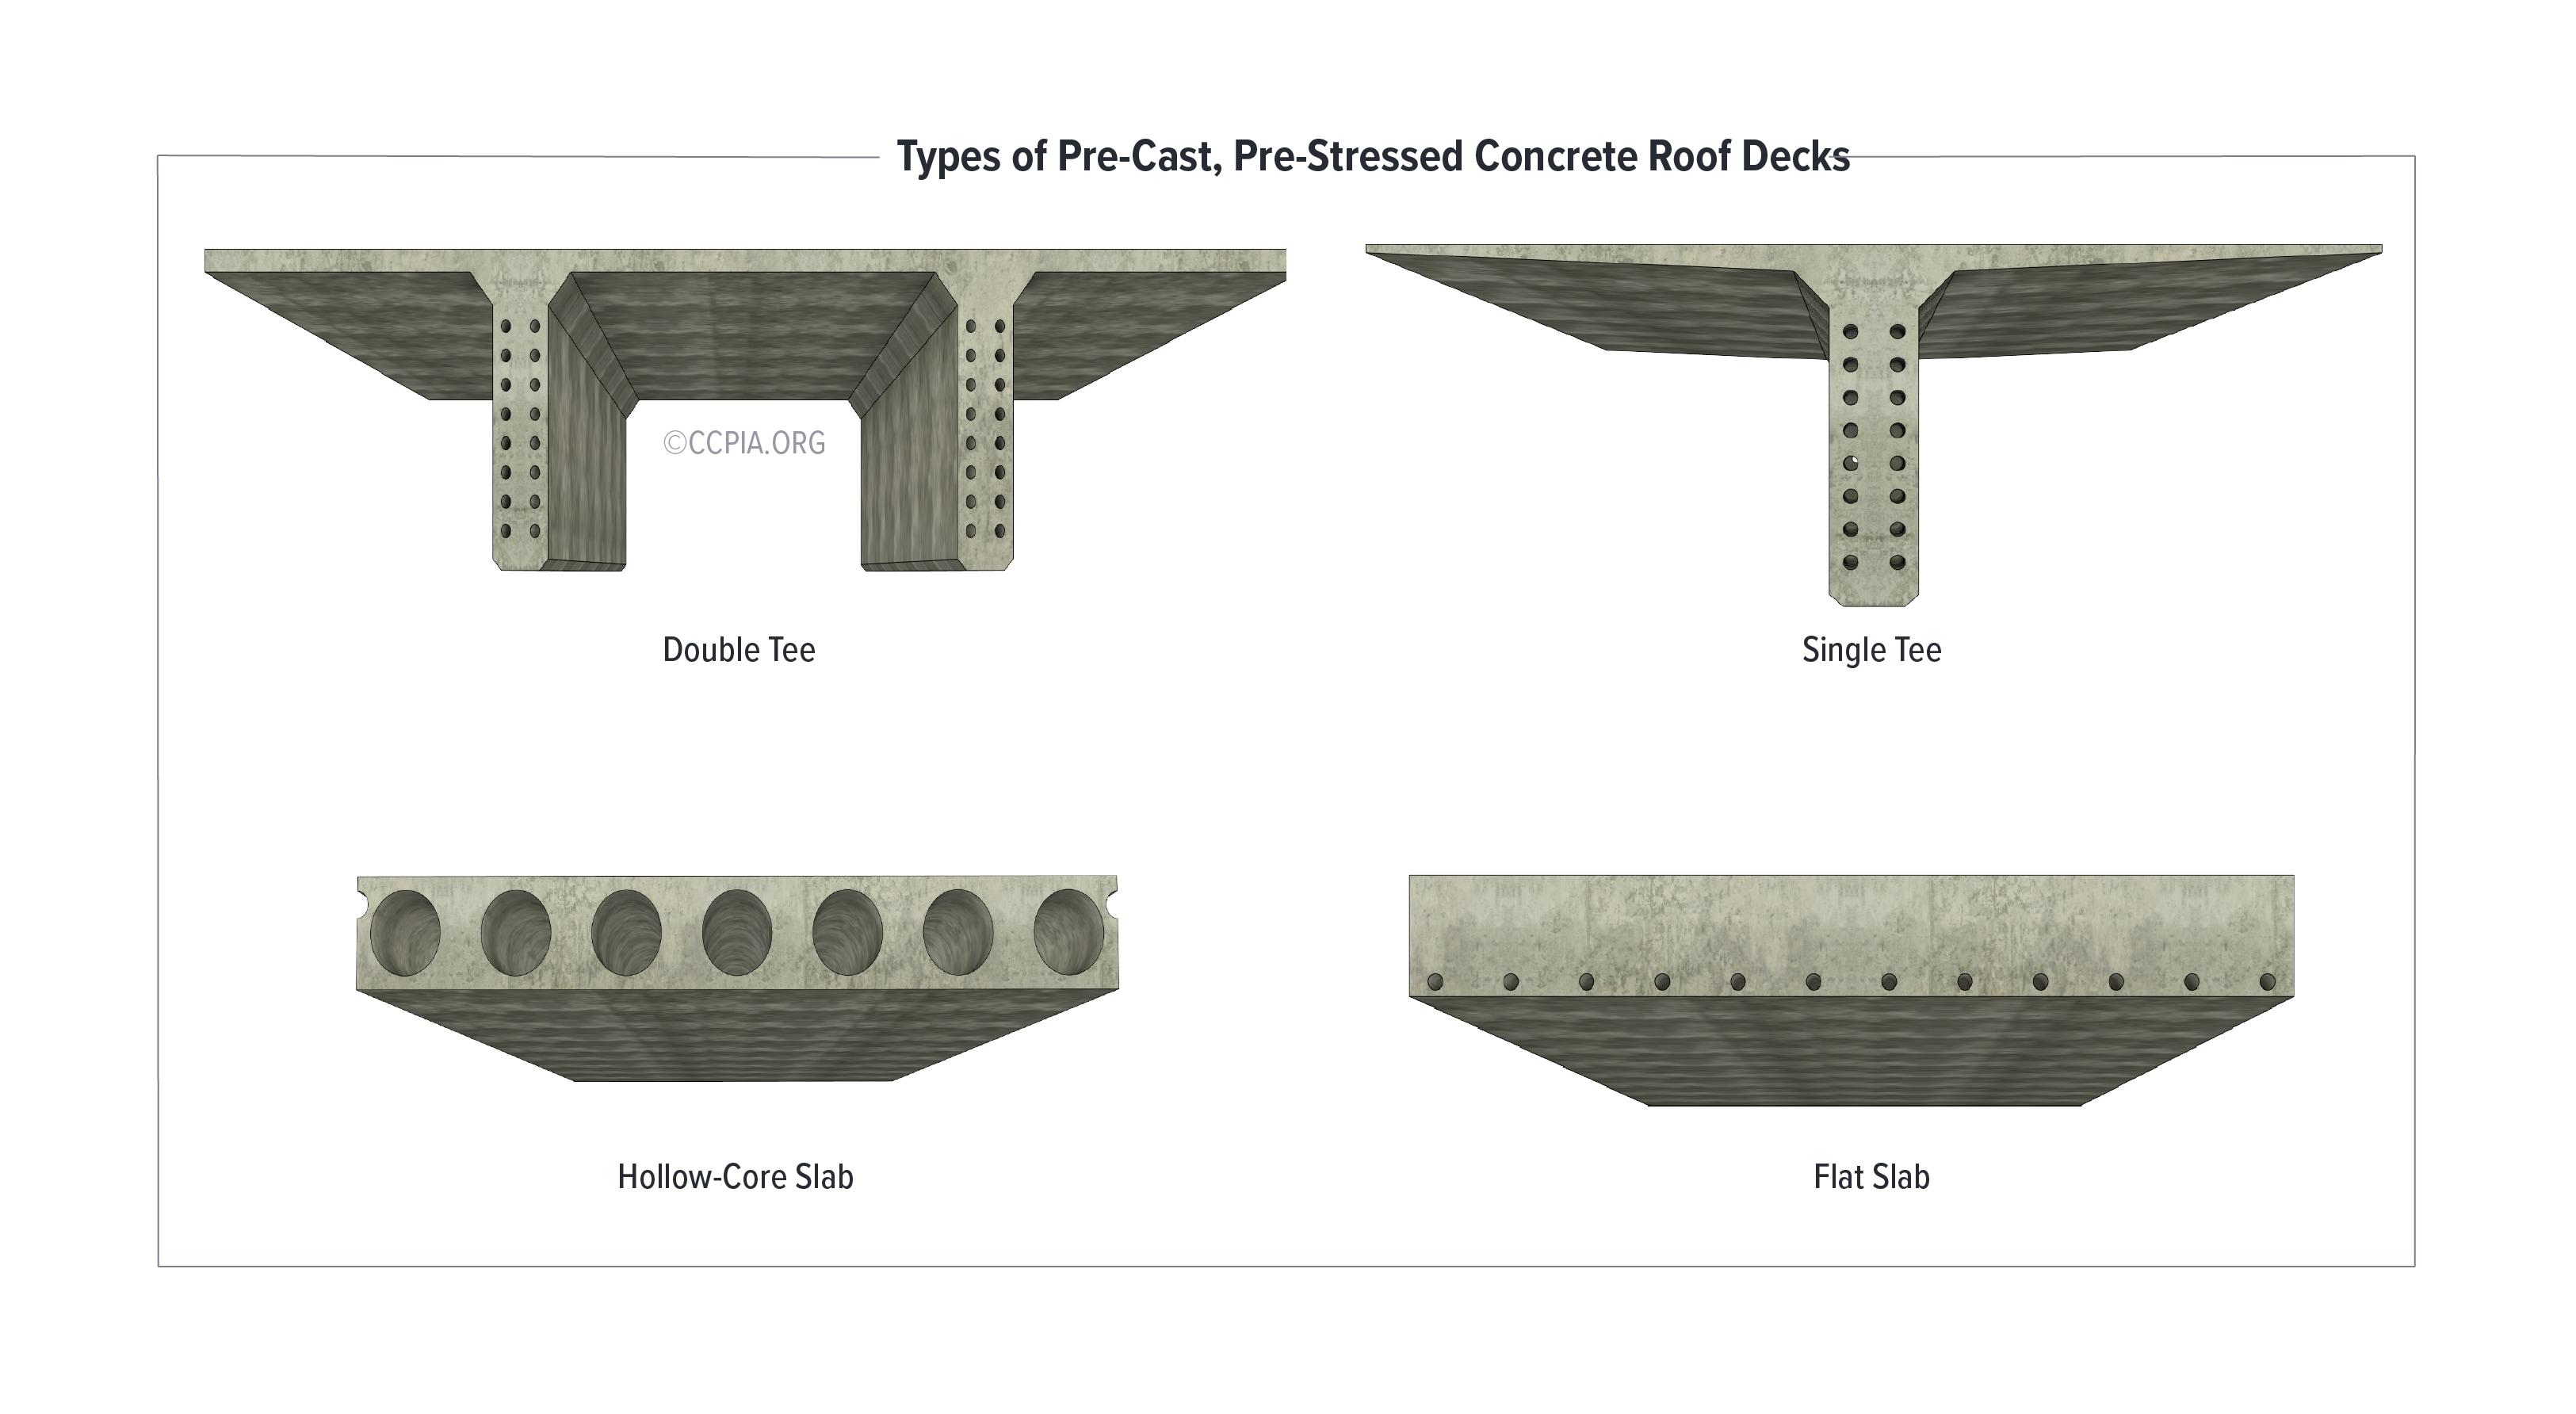 Types of Pre-Cast, Pre-Stressed Concrete Roof Decks: Single Tee, Double Tee, Hollow-Core Slab, Flat Slab